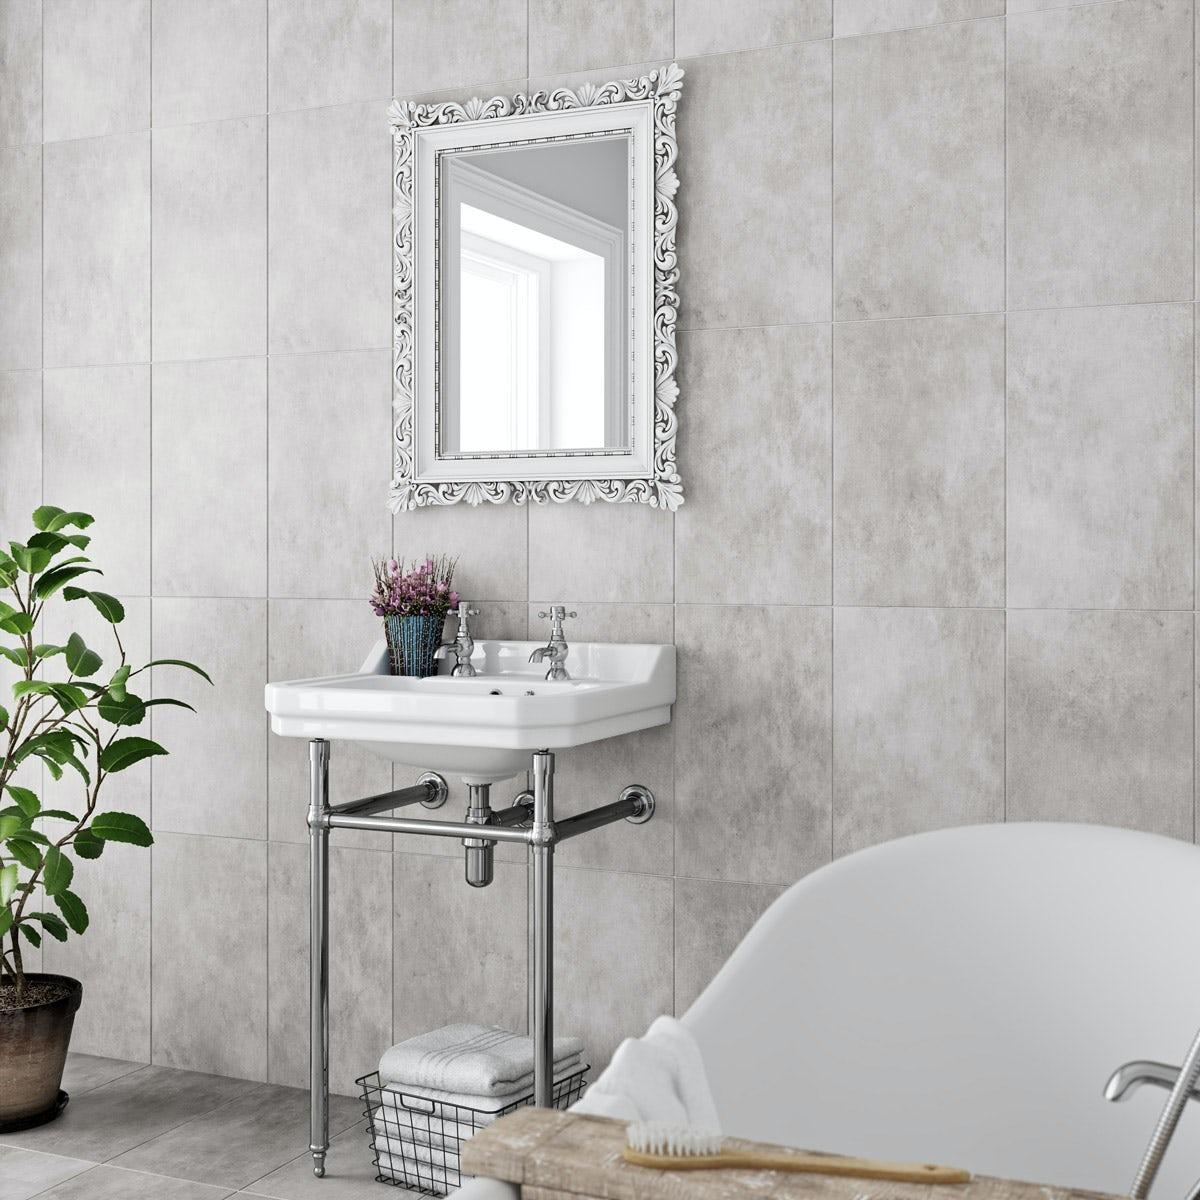 Laura Ashley Floor Tiles >> Laura Ashley Heritage plain dove grey wall floor tile